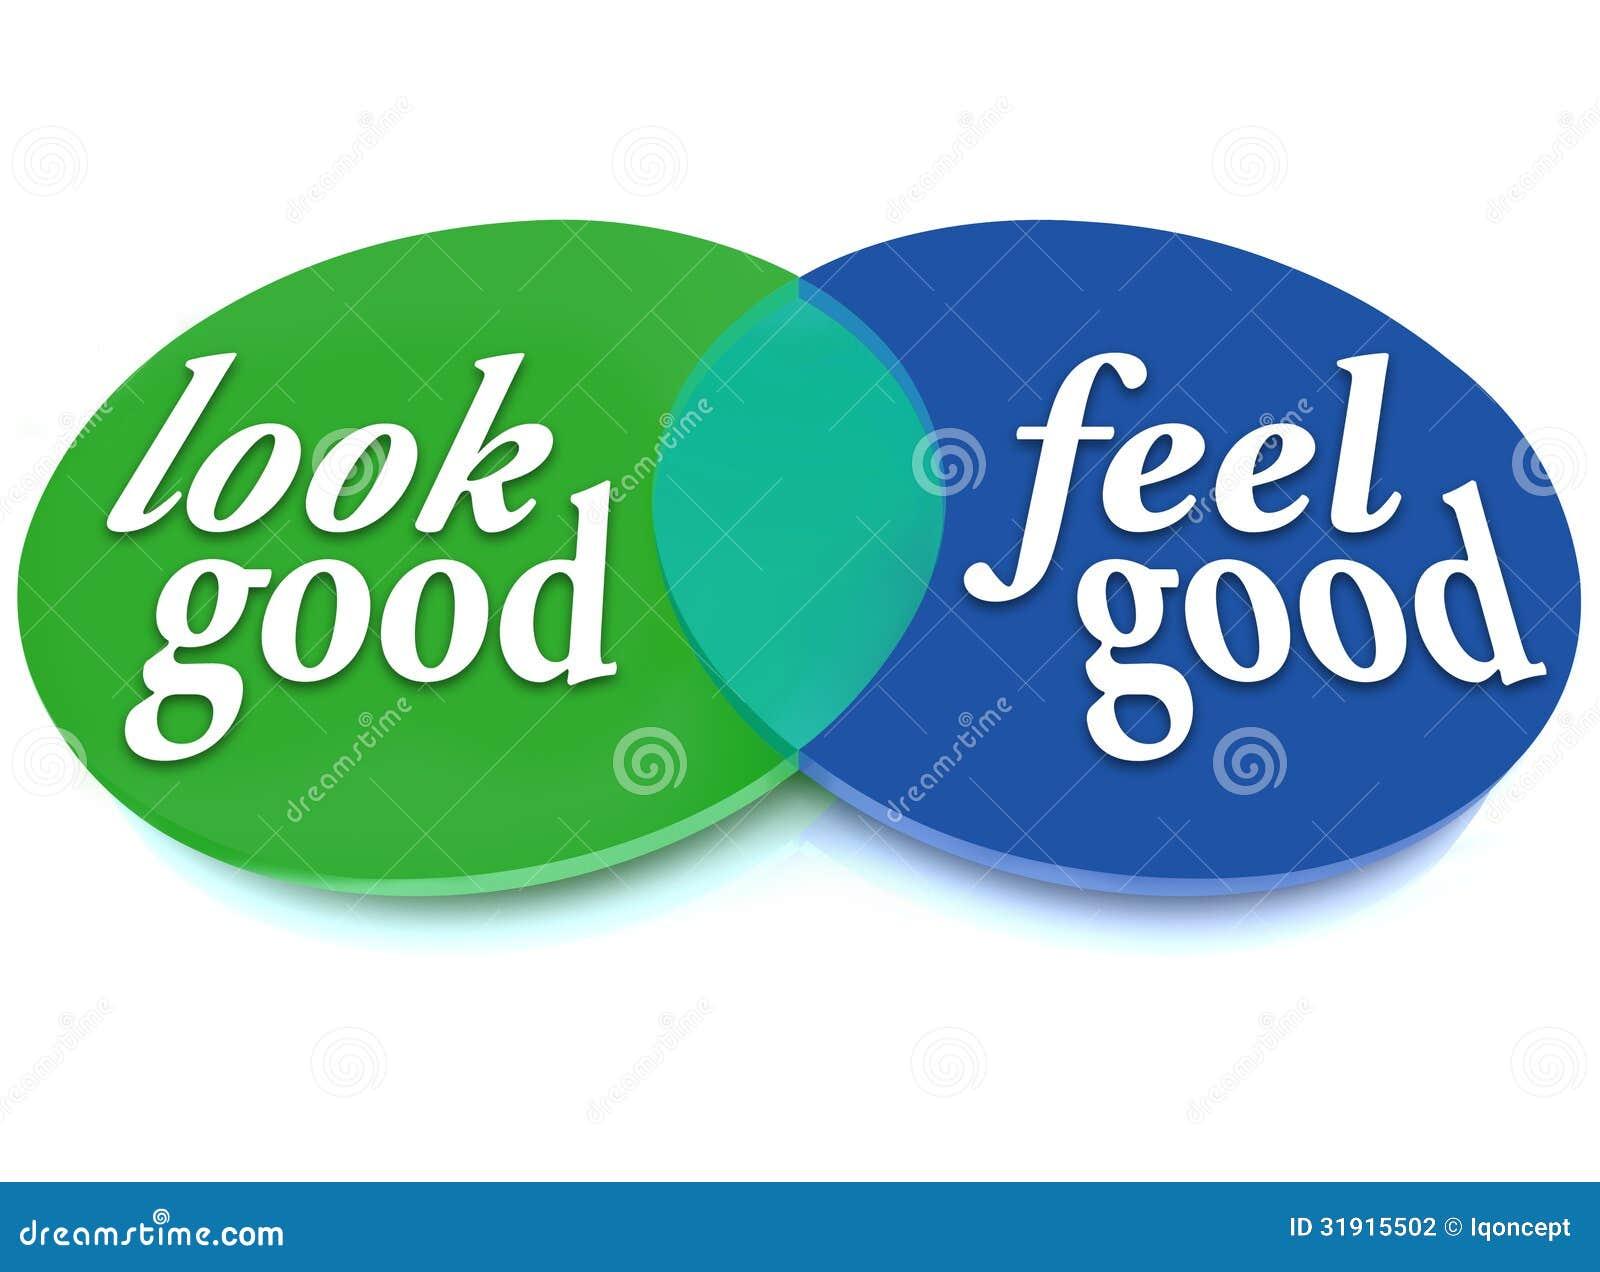 look and feel good venn diagram balance appearance vs health stock illustration illustration. Black Bedroom Furniture Sets. Home Design Ideas